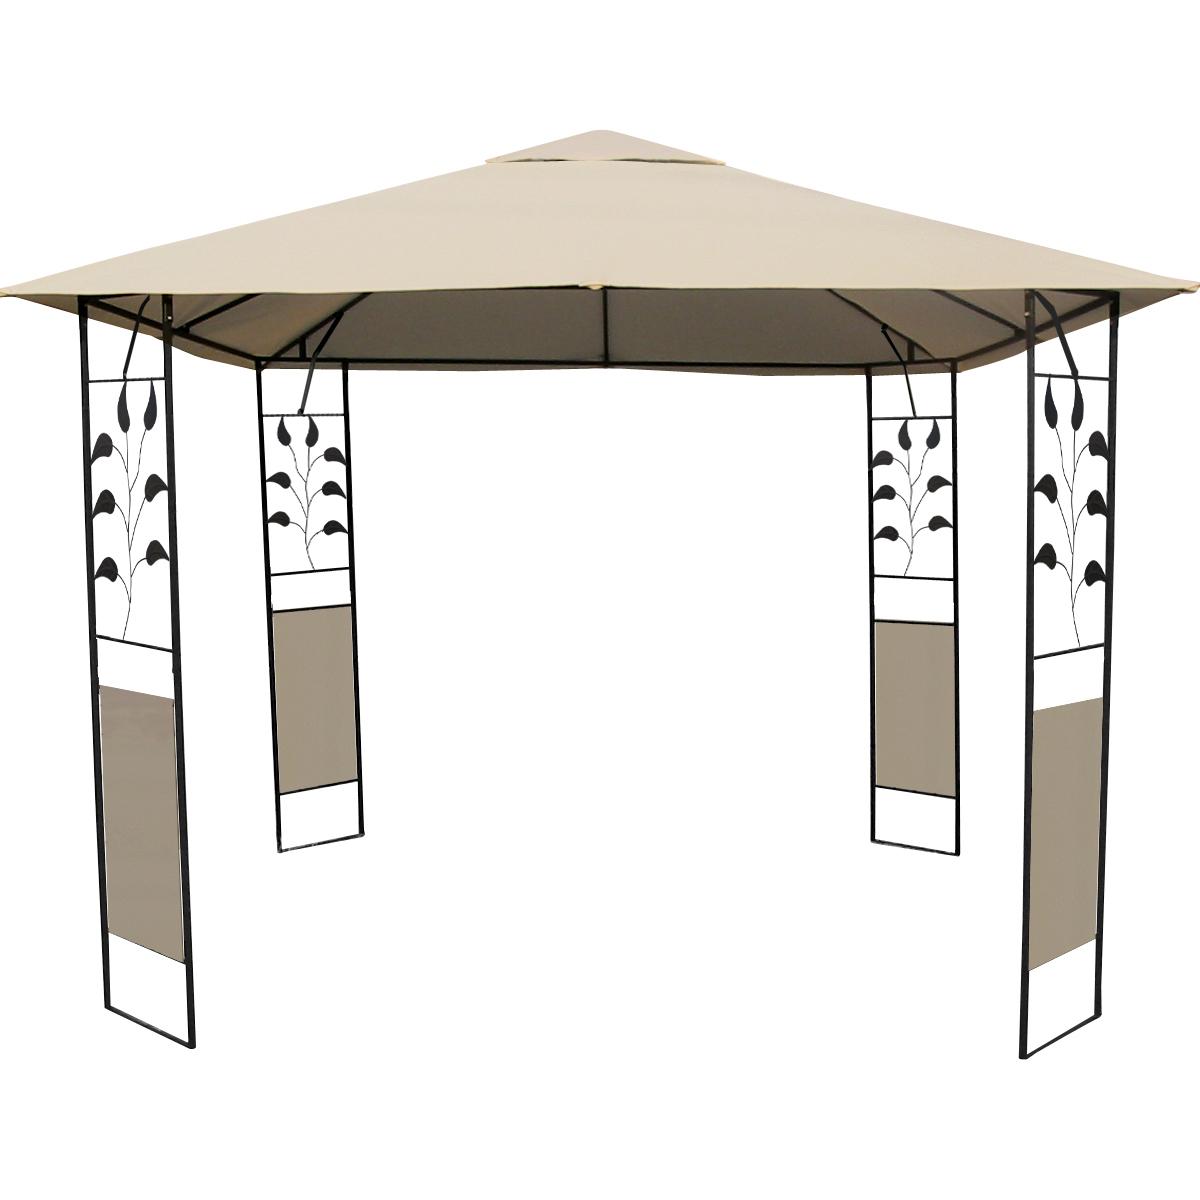 3X3 water proof fabric metal patio gazebo with screen